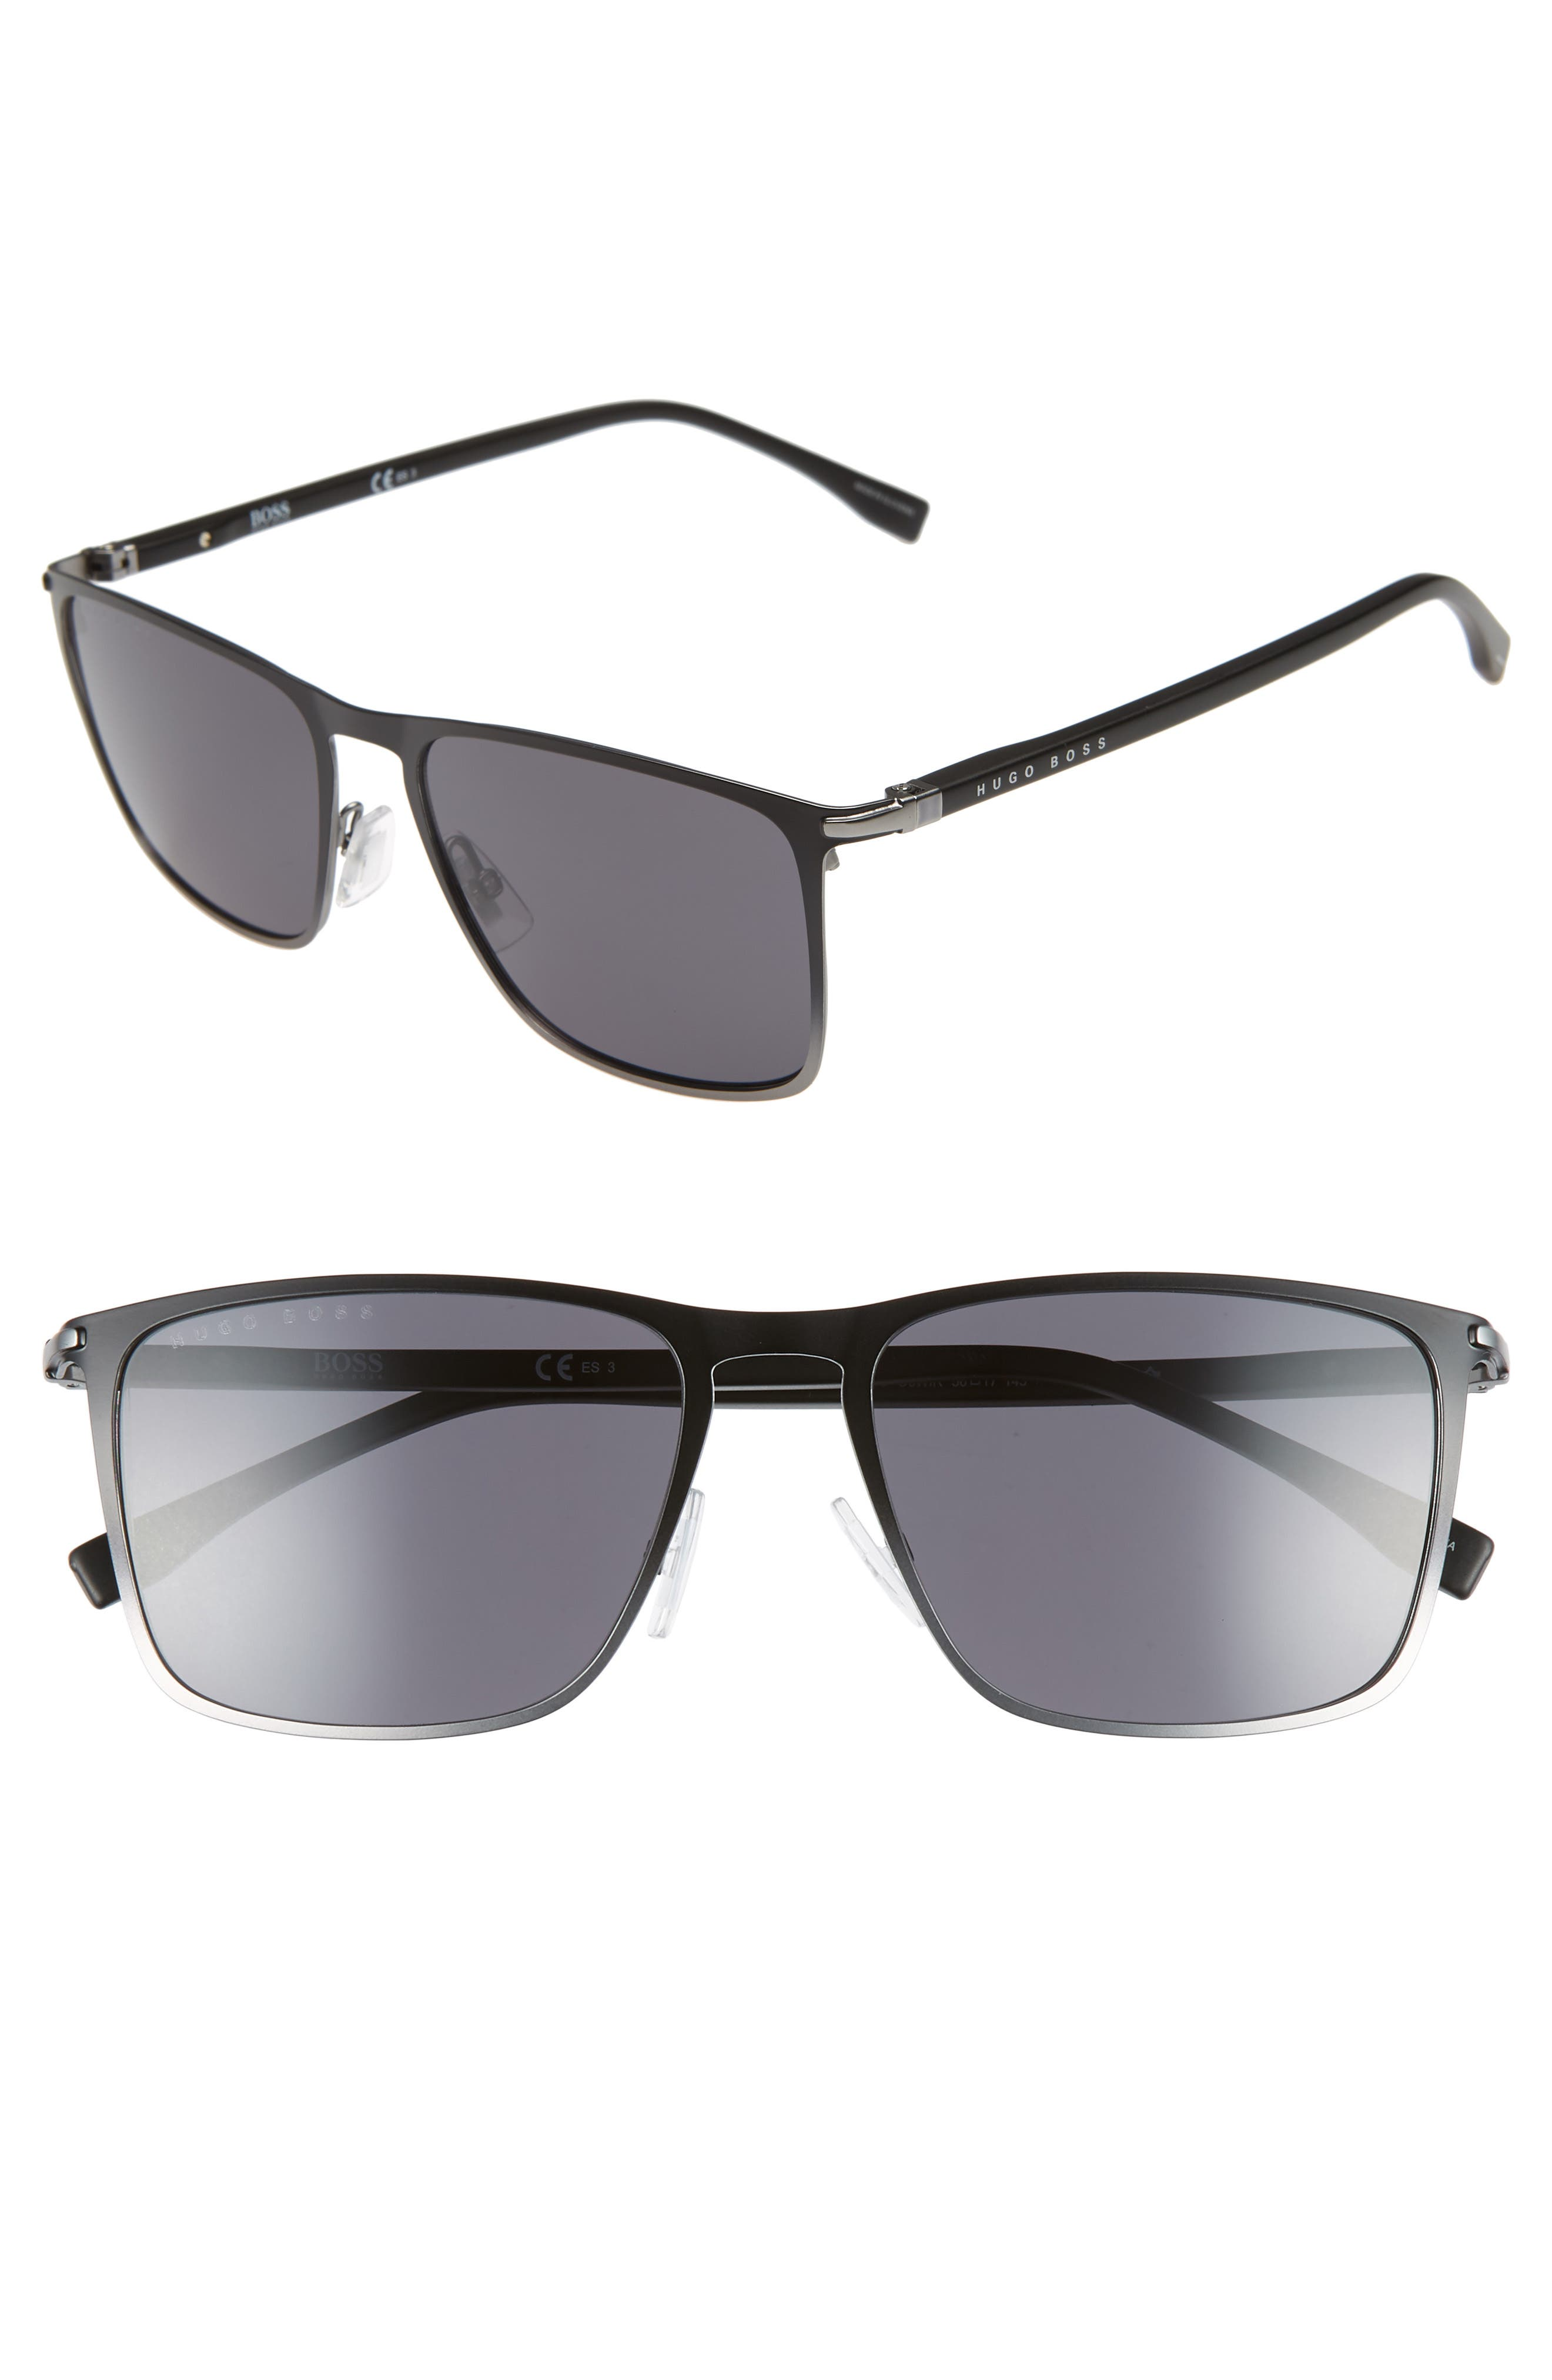 56mm Rectangular Sunglasses,                             Main thumbnail 1, color,                             BLACK RUTHENIUM